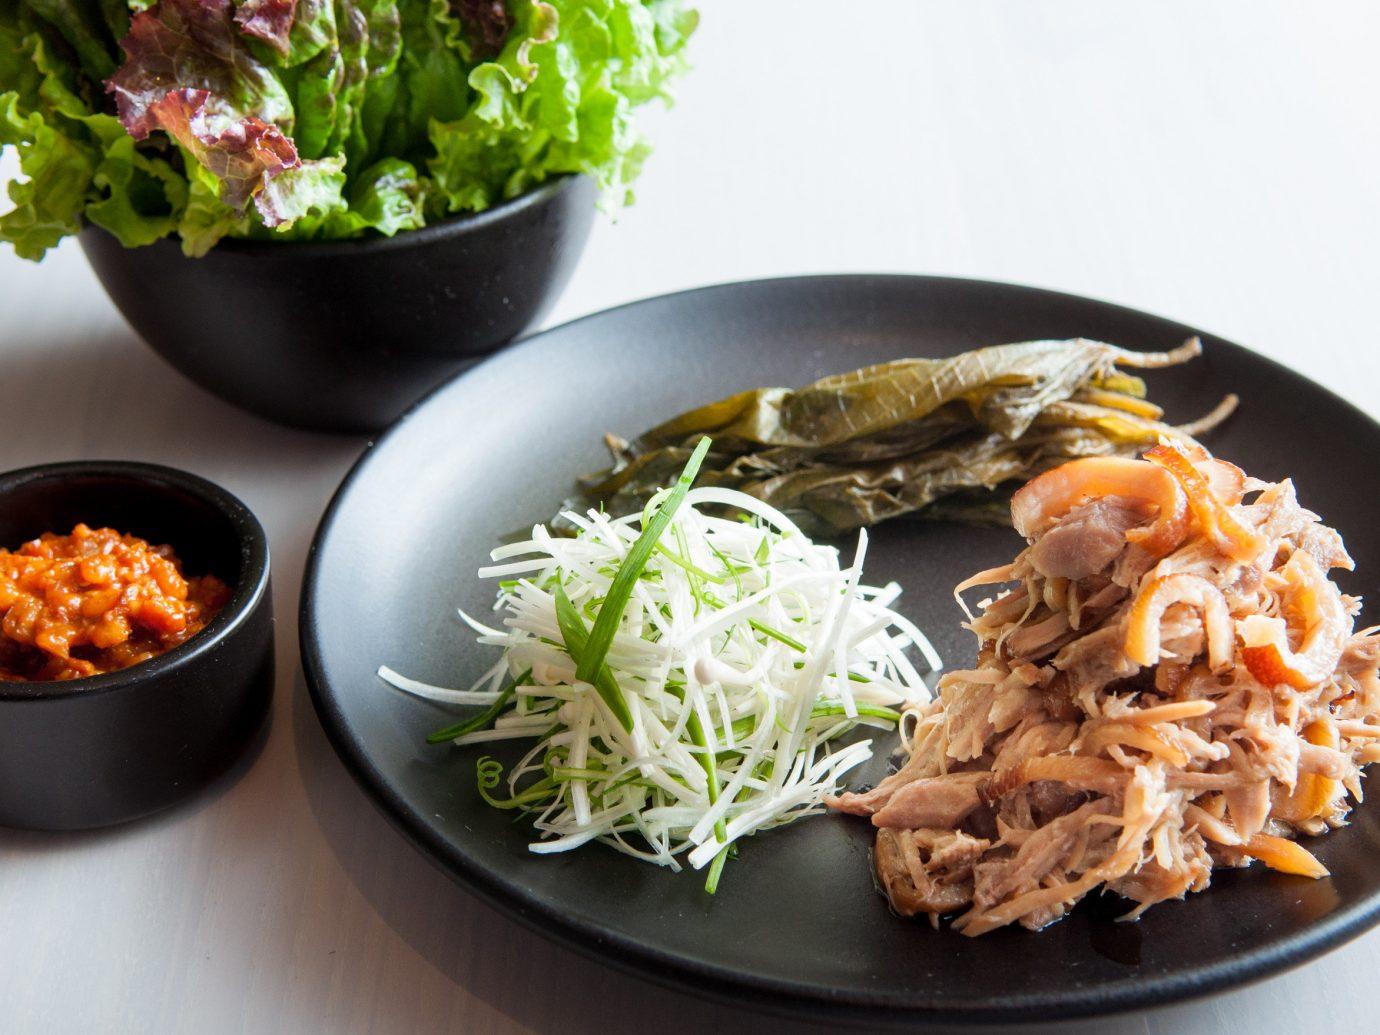 Food + Drink Travel Tips food plate dish cuisine meal bowl lunch vegetarian food asian food thai food recipe vegetable side dish korean food chinese food namul meat saute